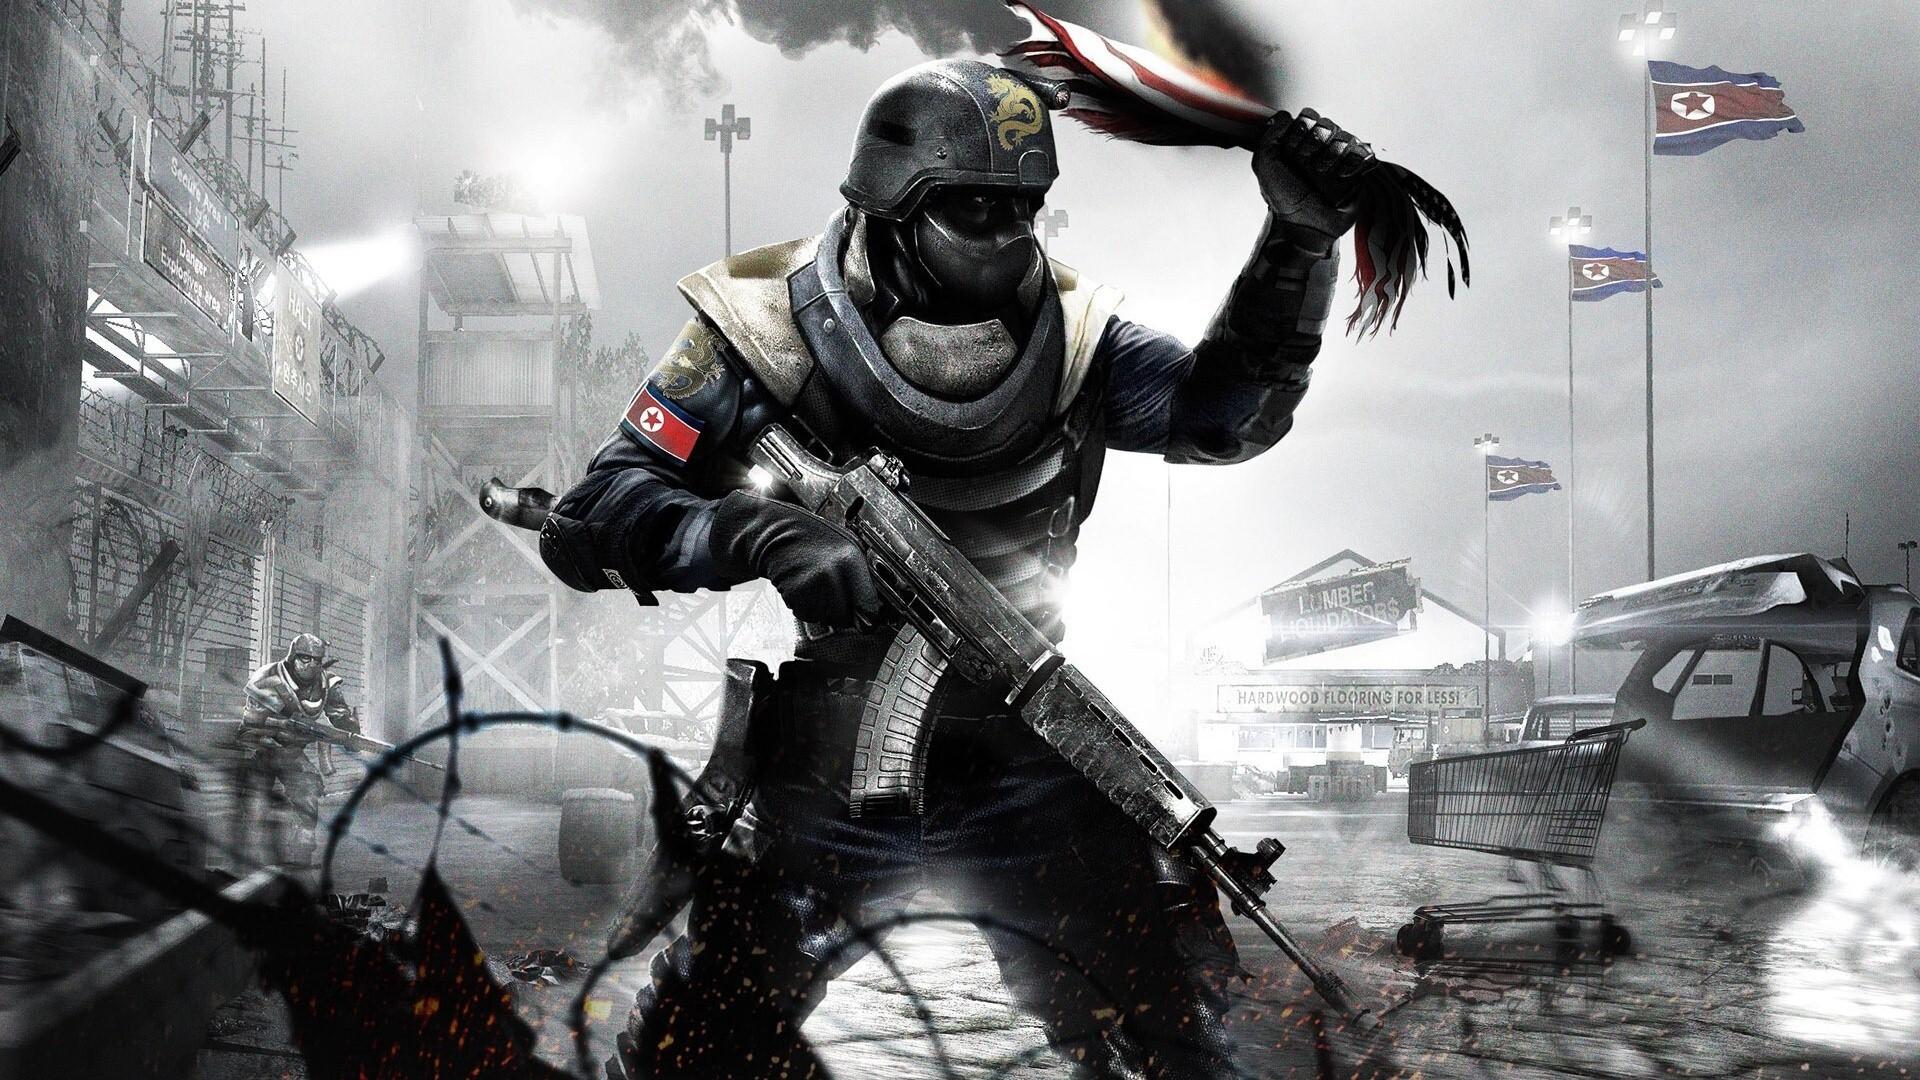 action game hd desktop background wallpaper | hd wallpapers